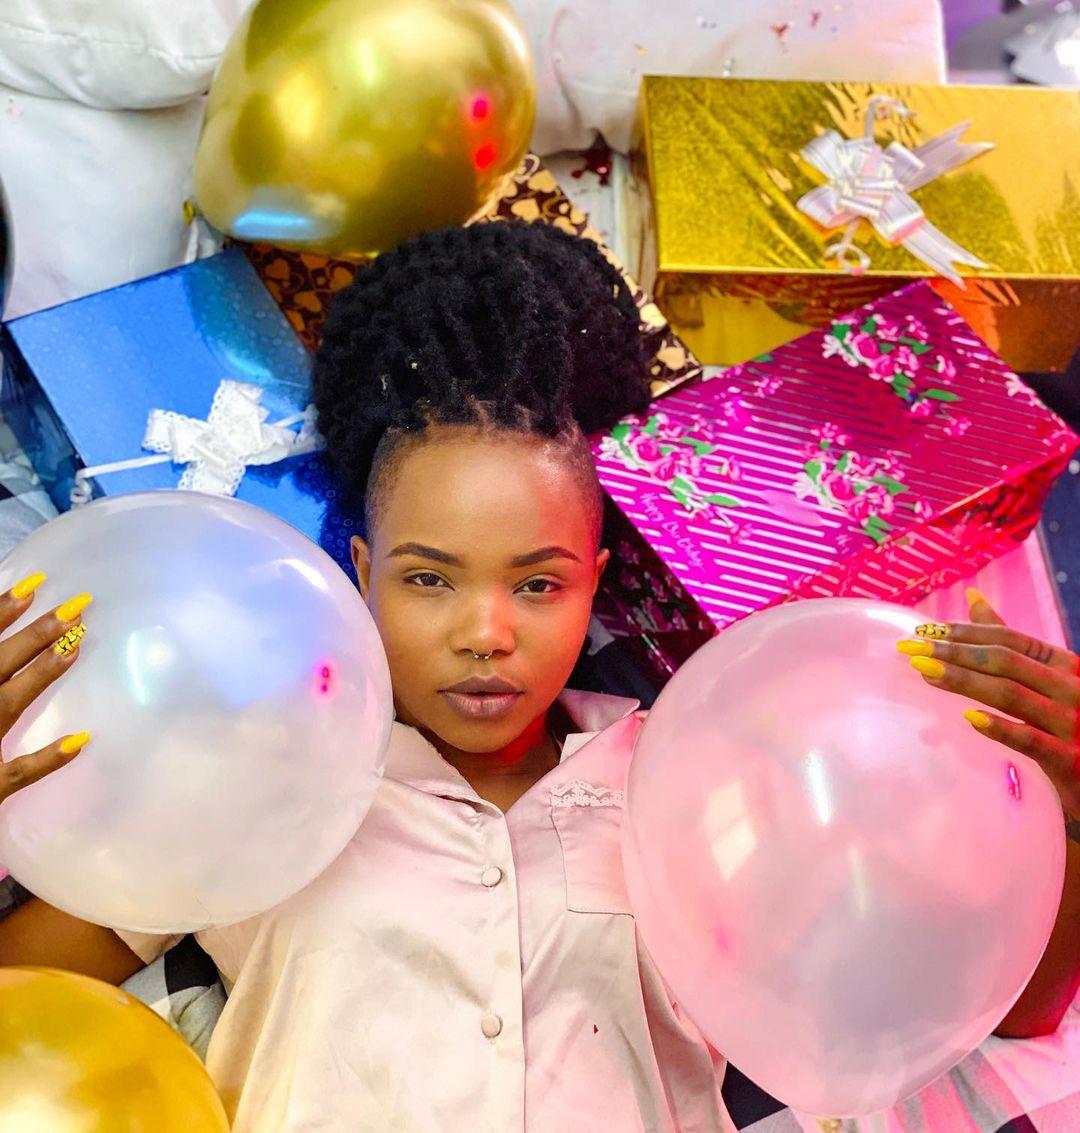 VIDEO Rosa Ree - It's Your Birthday MP4 DOWNLOAD — citiMuzik